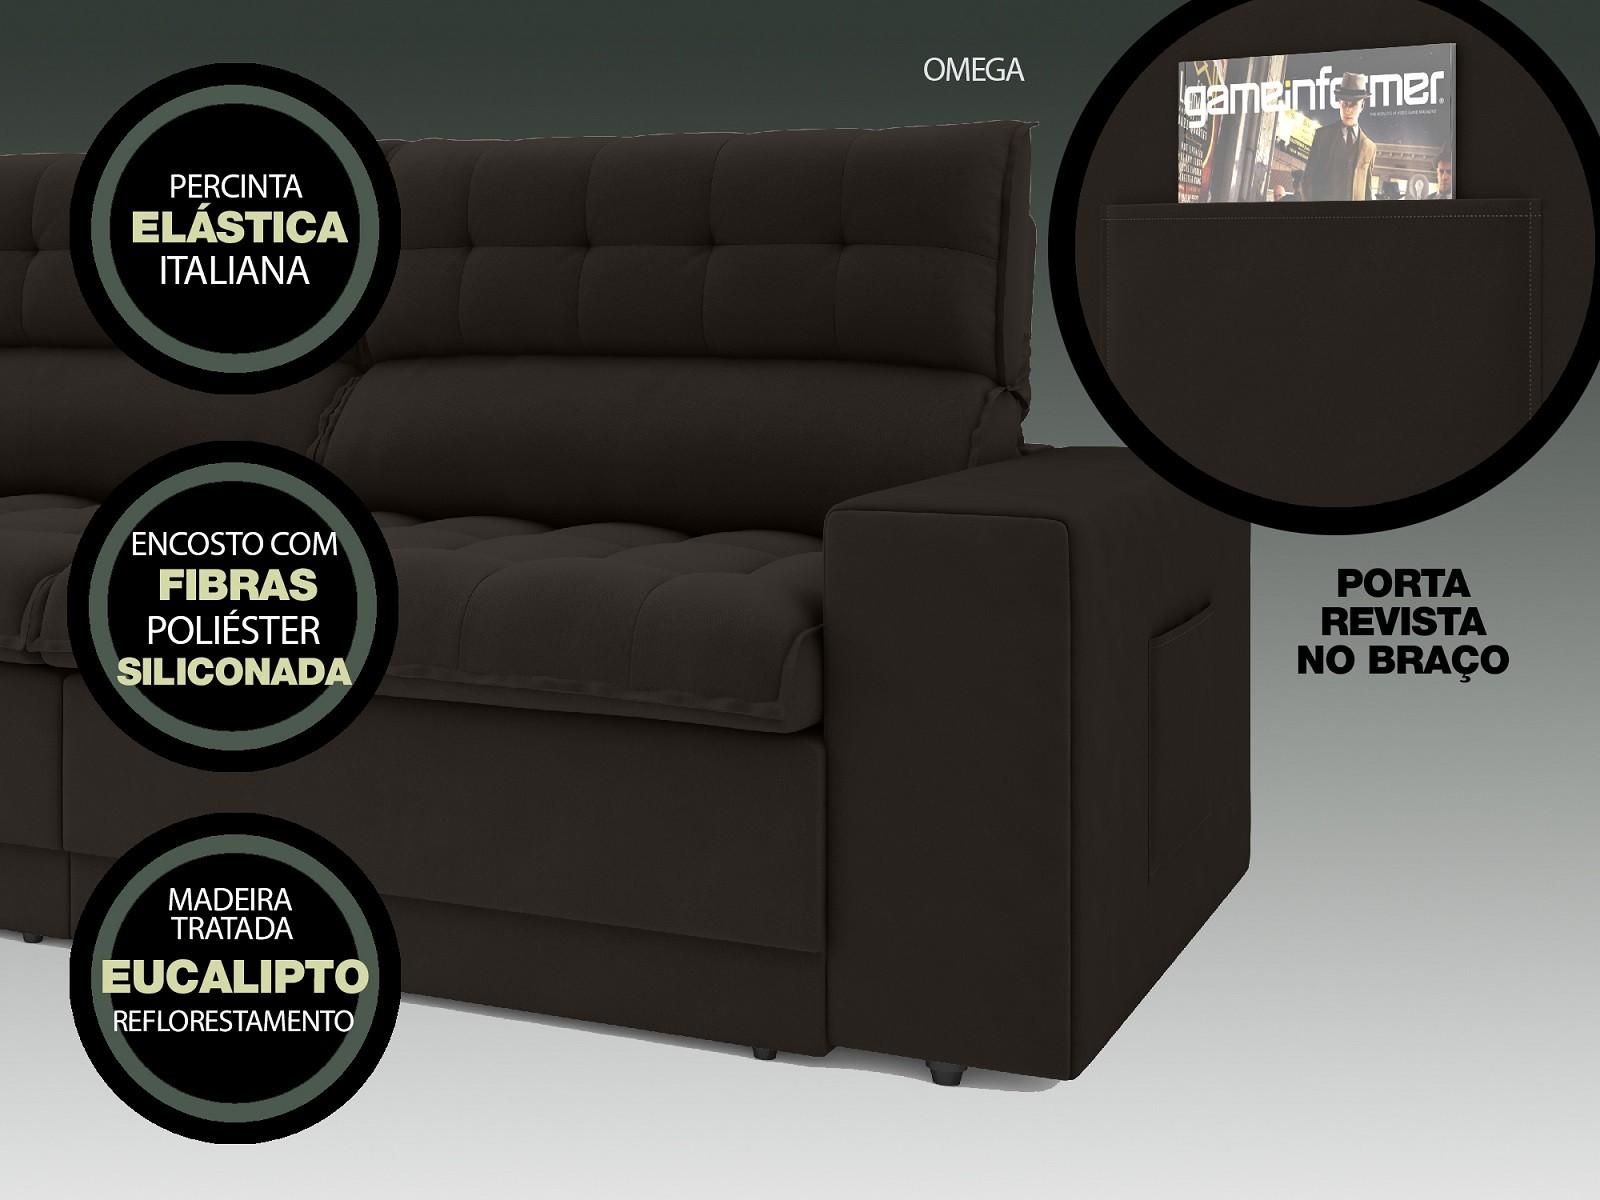 Sofá Omega 2,00m Assento Retrátil e Reclinável Velosuede Chocolate - NETSOFAS  - NETSOFÁS